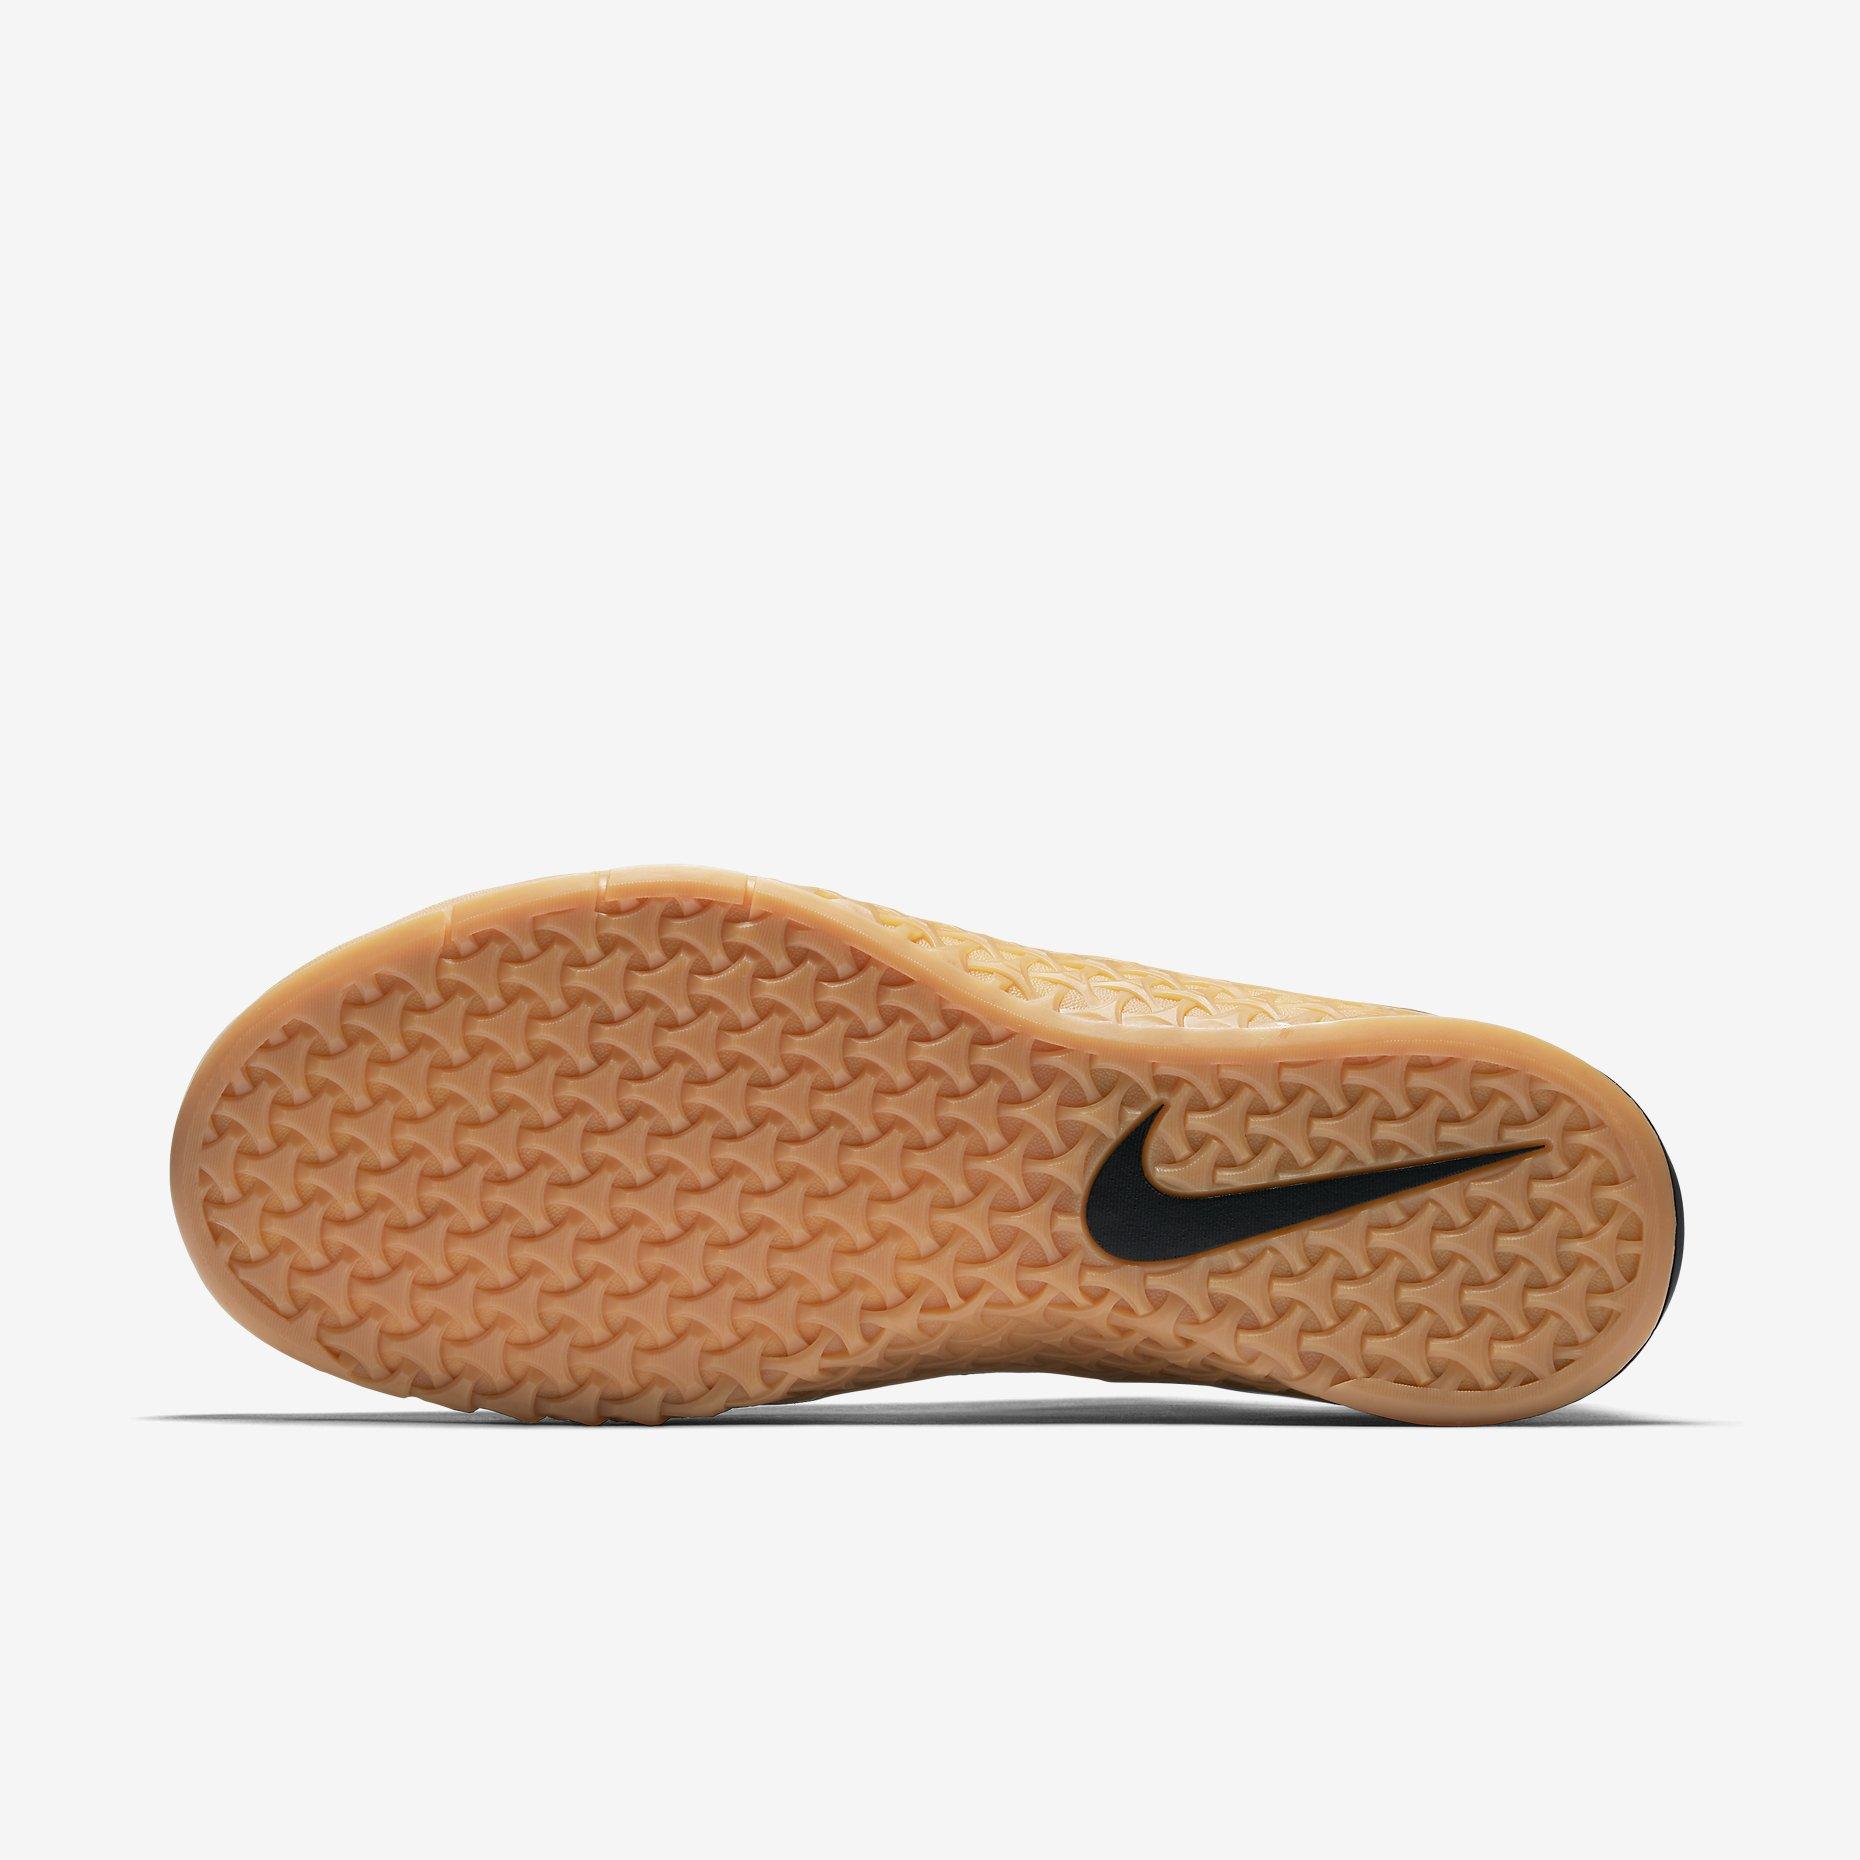 metcon-3-x-mens-training-shoe (1)